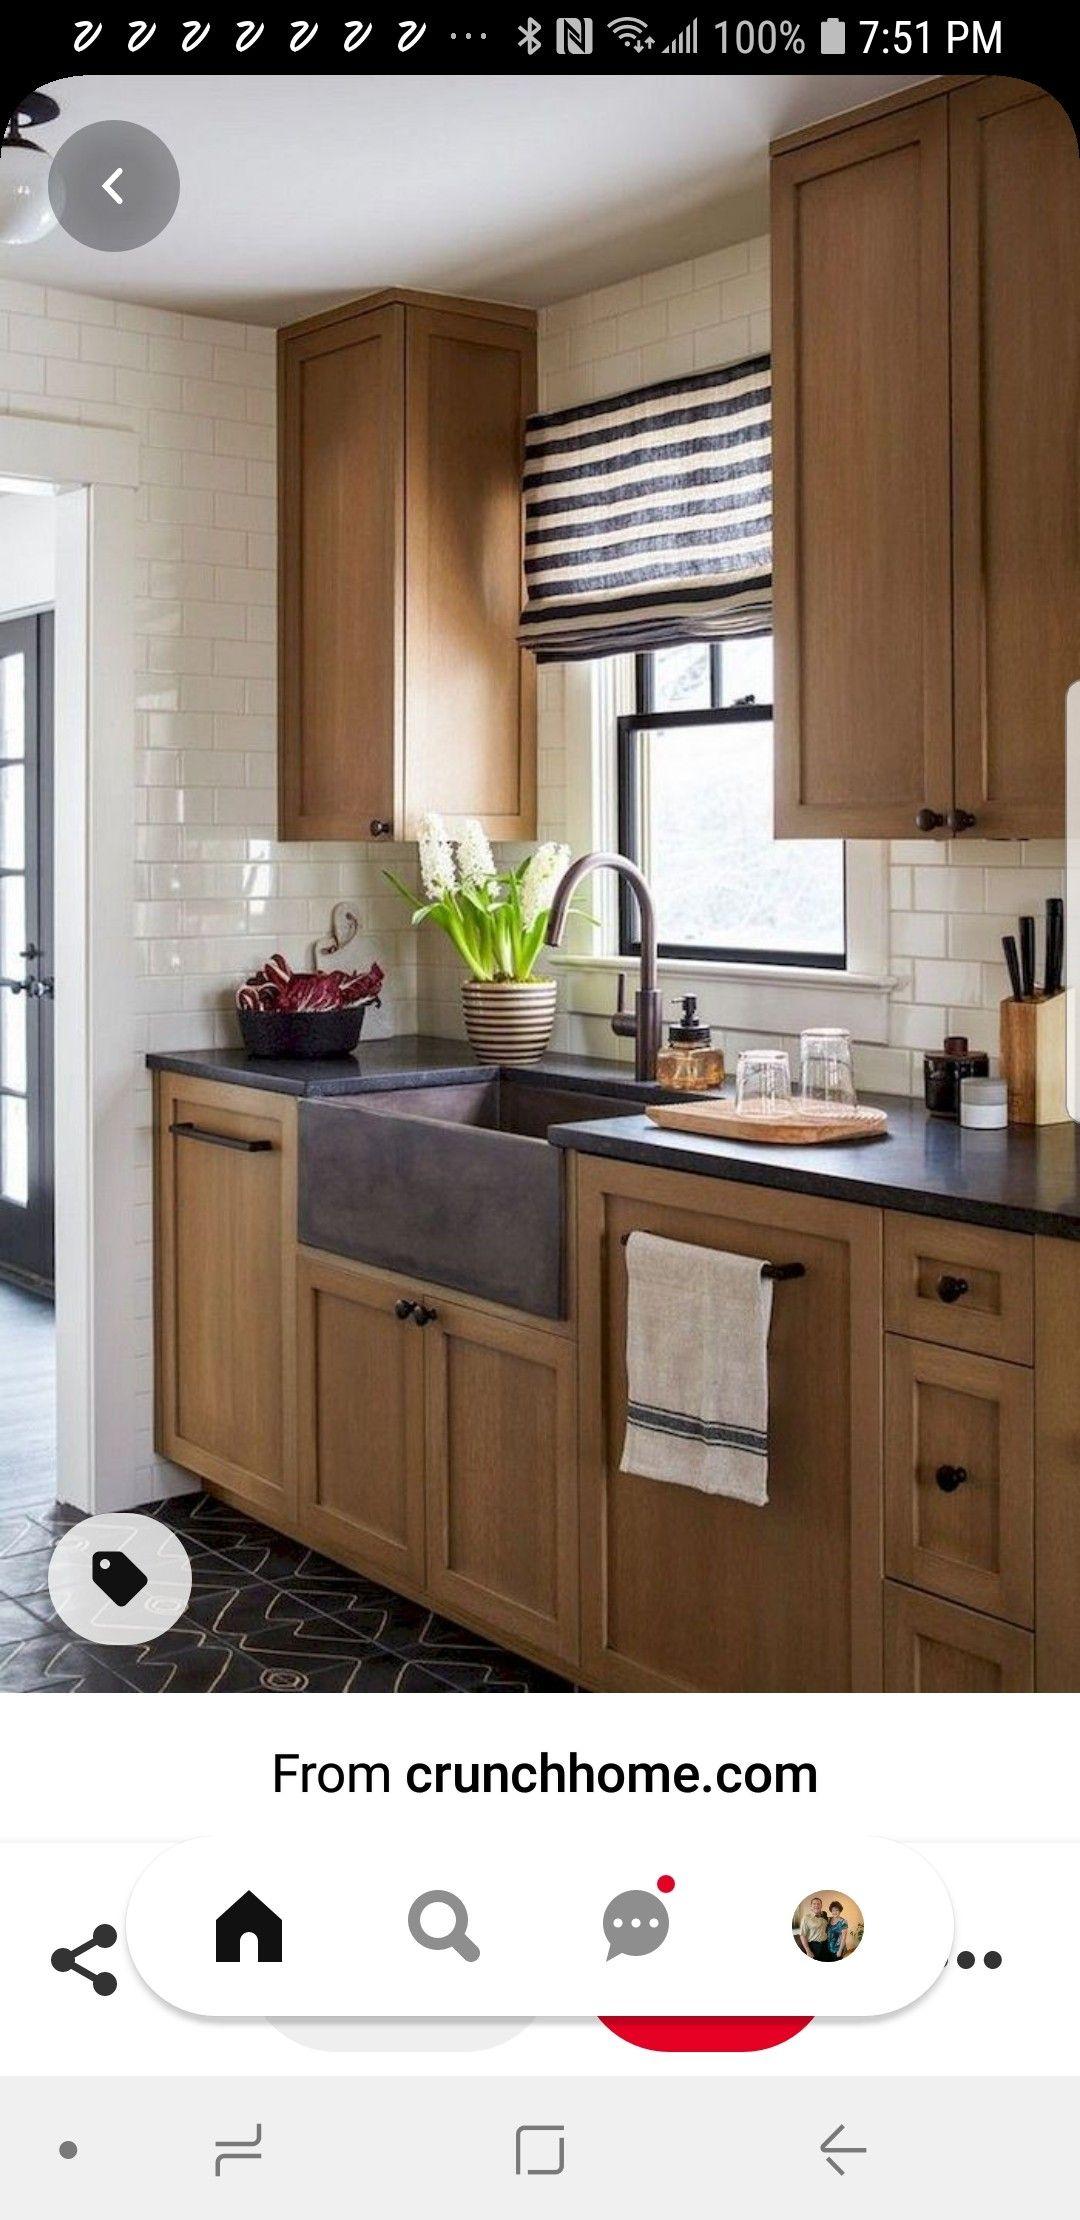 Pin by Leslie Hayes Erven on Kitchen ideas   Kitchen, Home decor ...